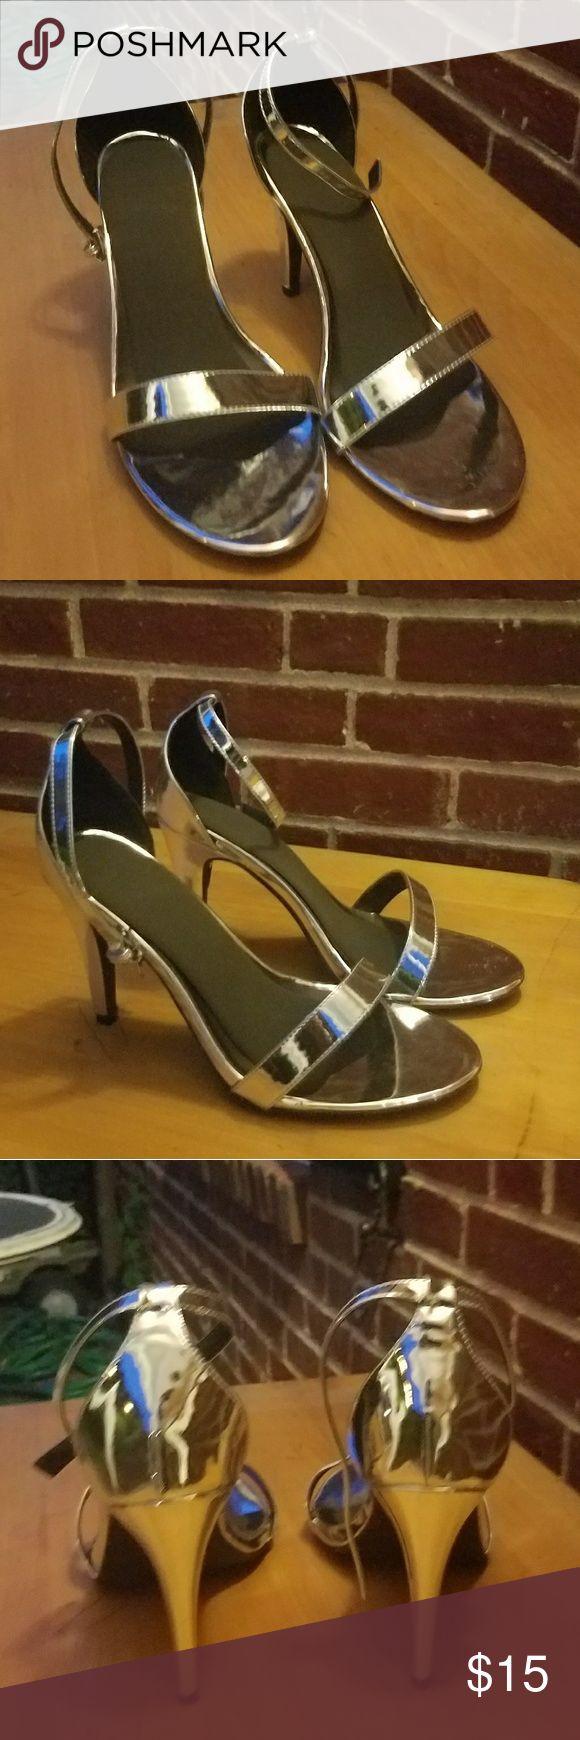 Ashley Stewart Silver Heels Silver Heels, good for wide feet Ashley Stewart Shoes Heels